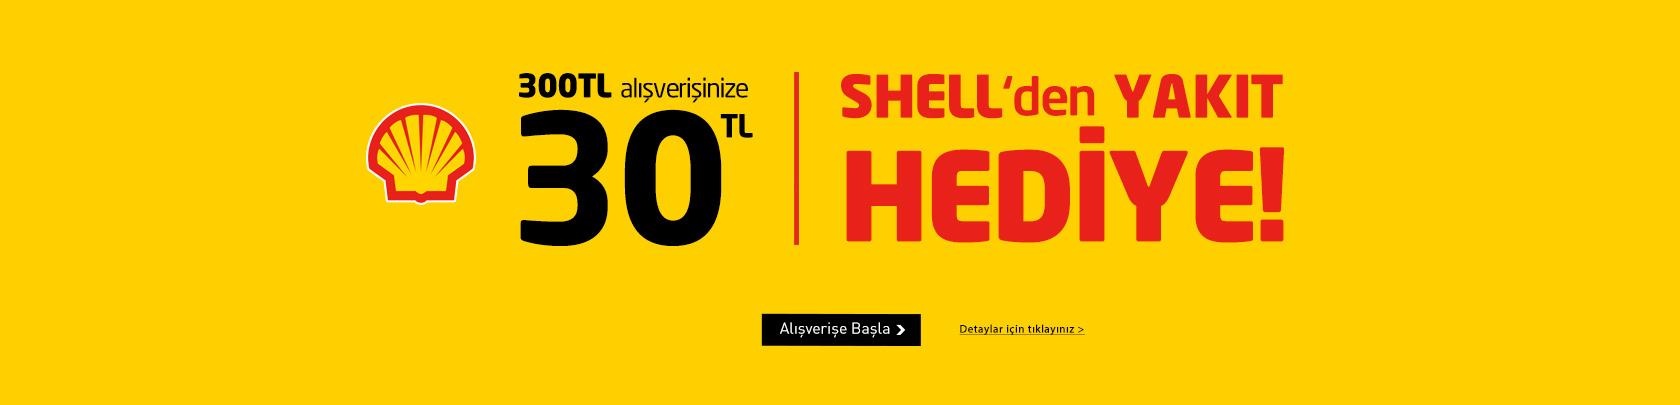 ykm-indirim-kuponu-shell